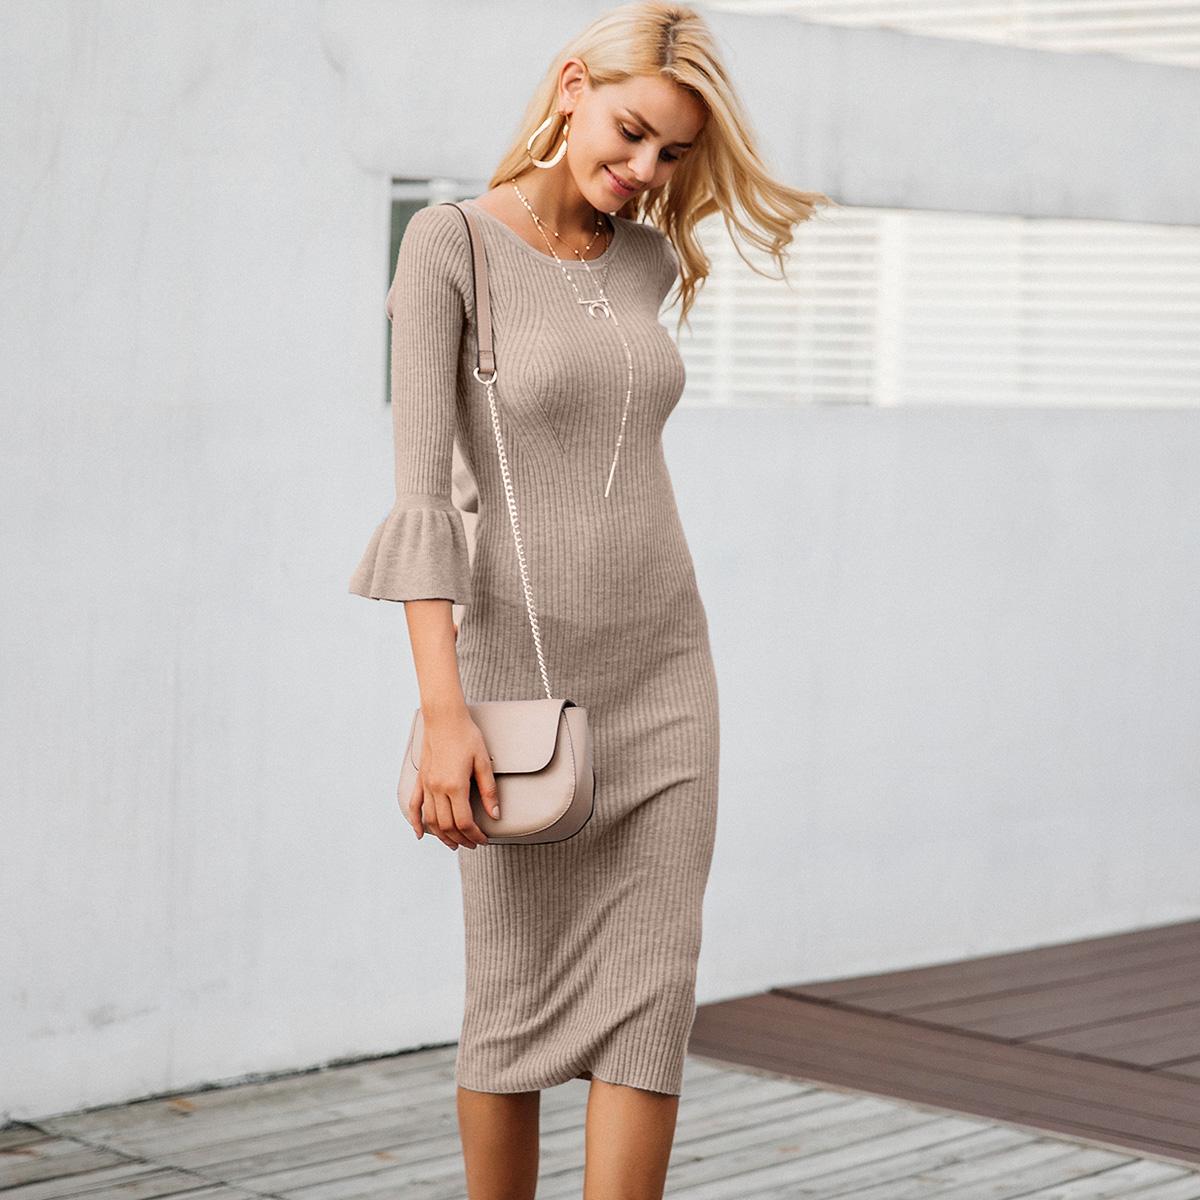 2019 new sexy skirt fashion women39s wholesale NHDE190241